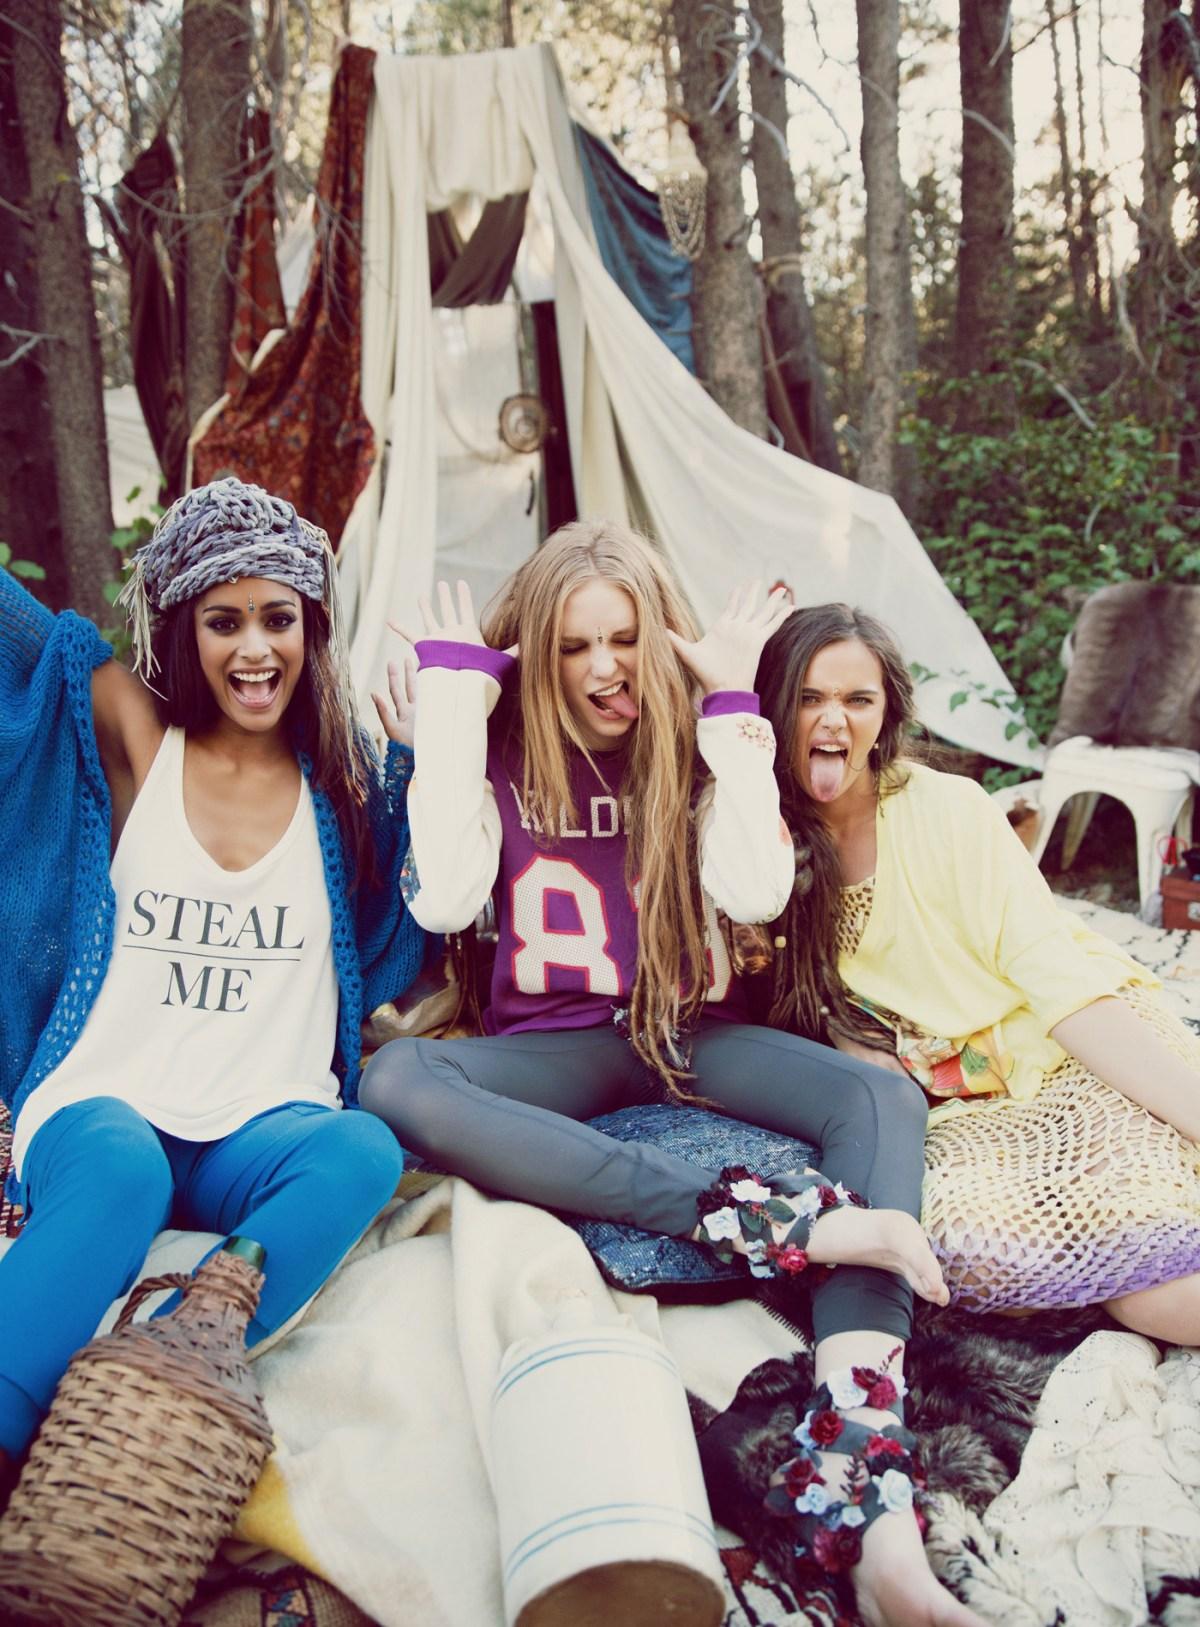 wildfox-spring-2015-ad-campaign-the-impression-20